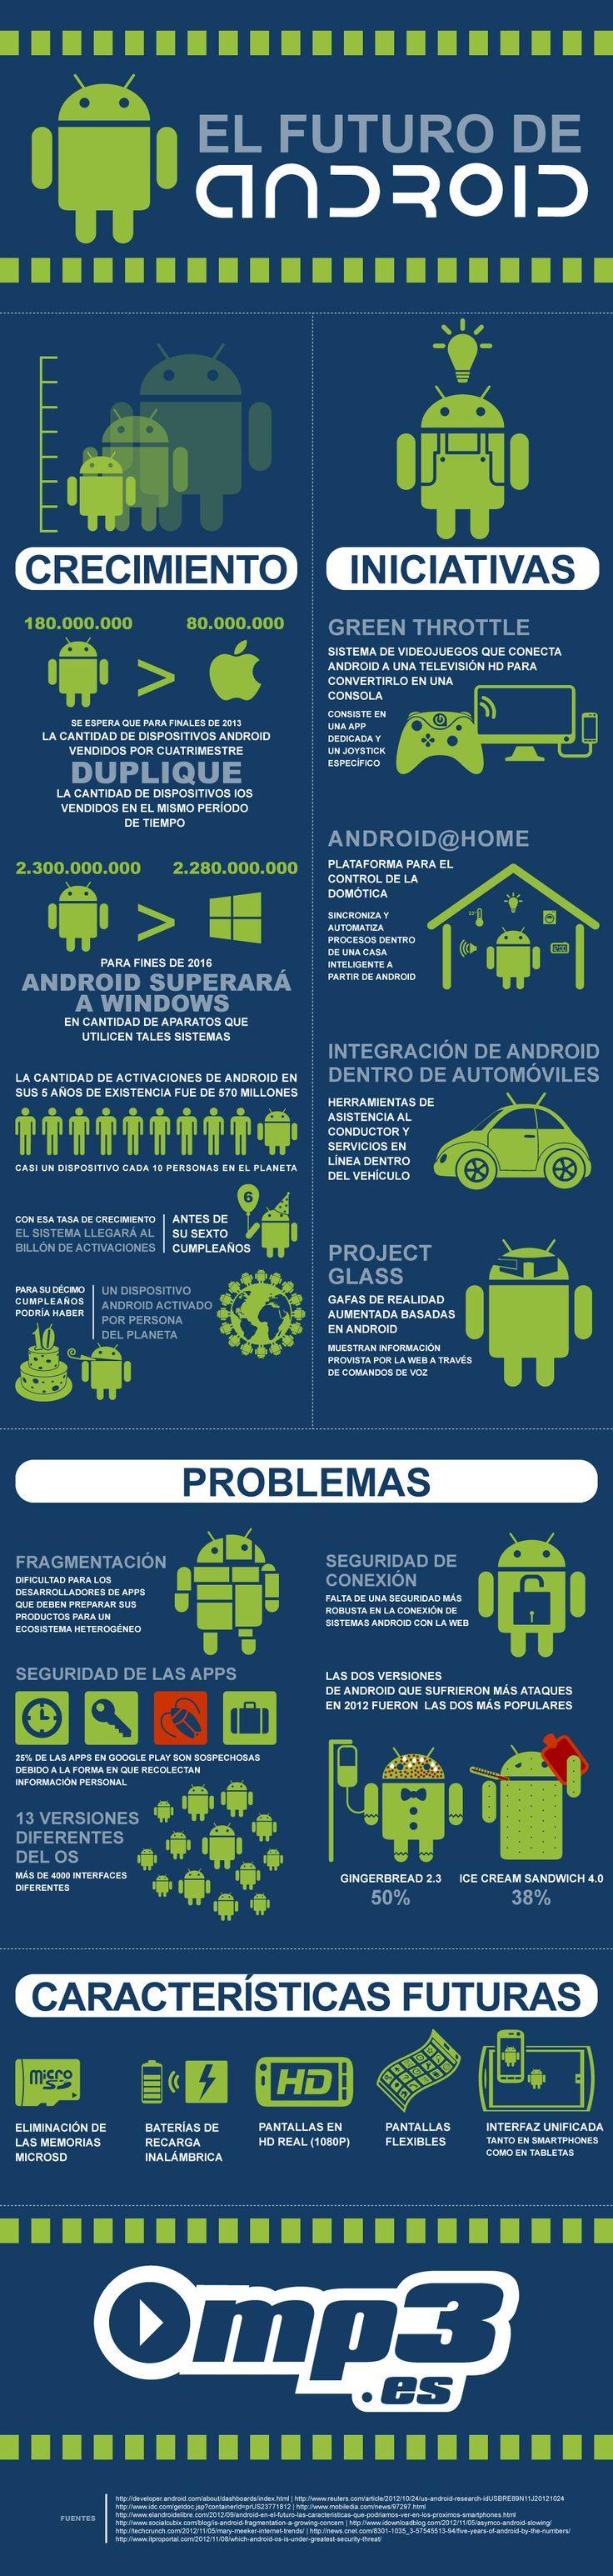 El futuro de Android #infografia #infographic #software